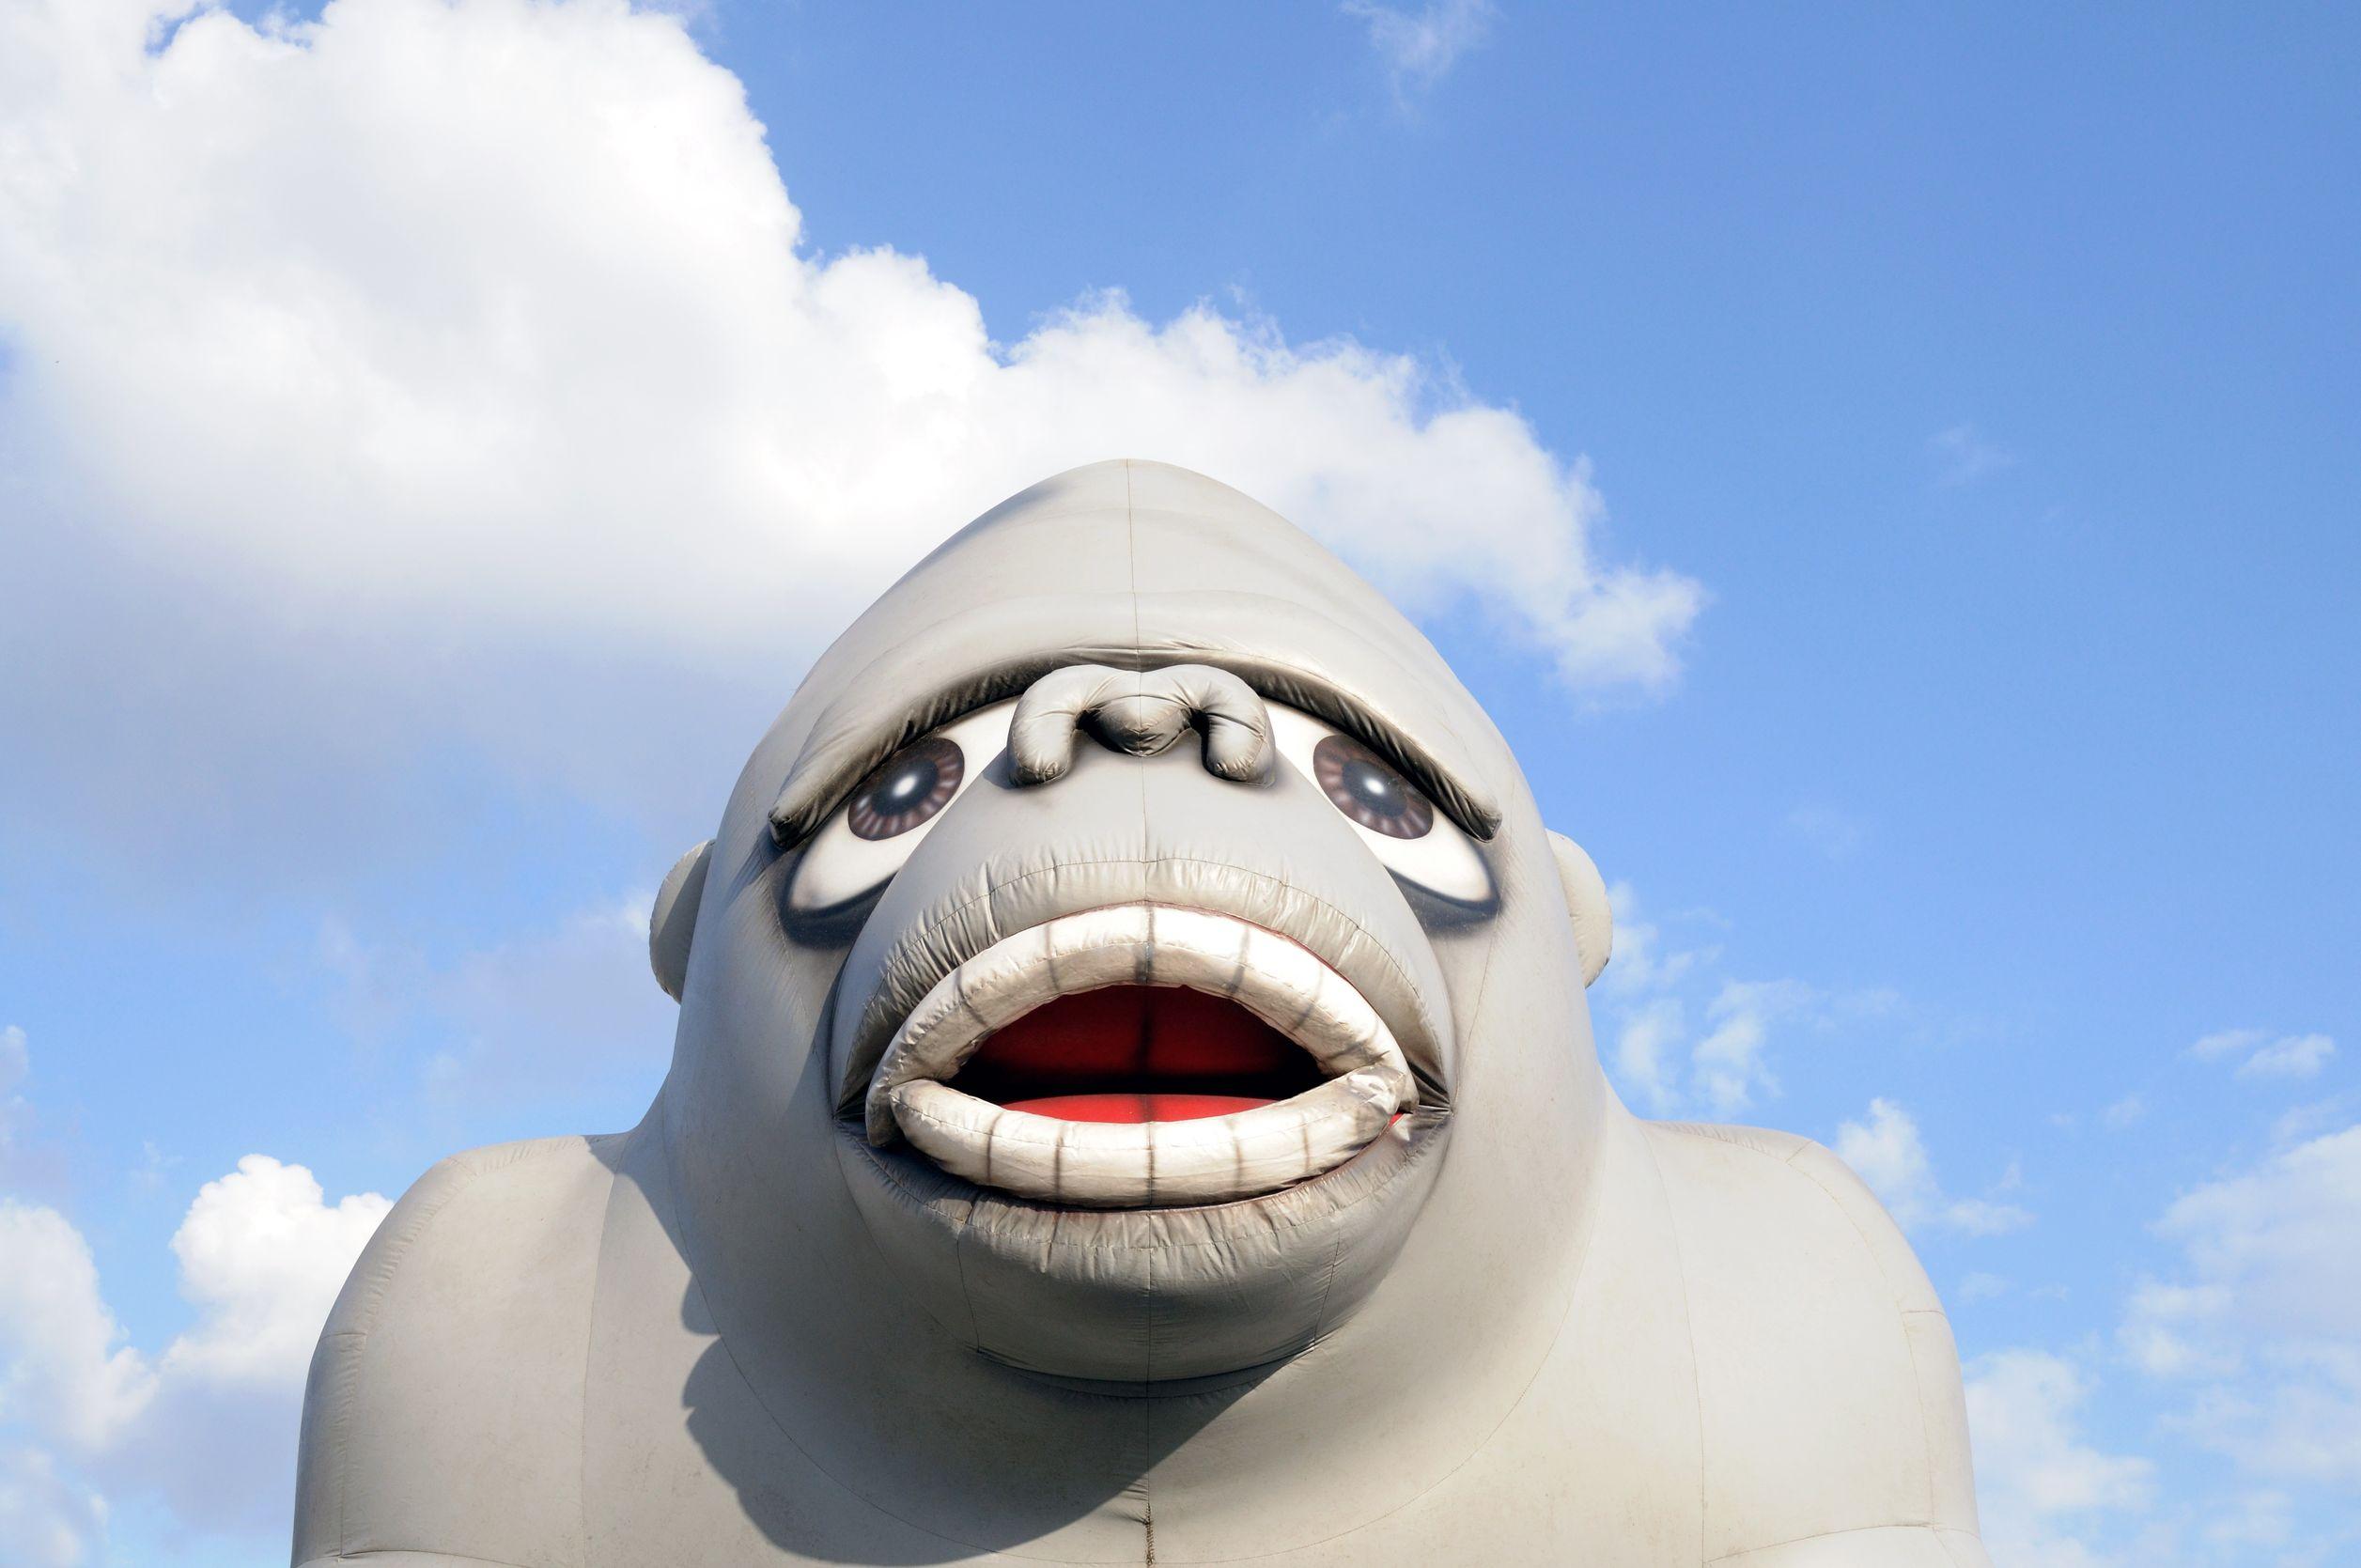 inflatablegorilla